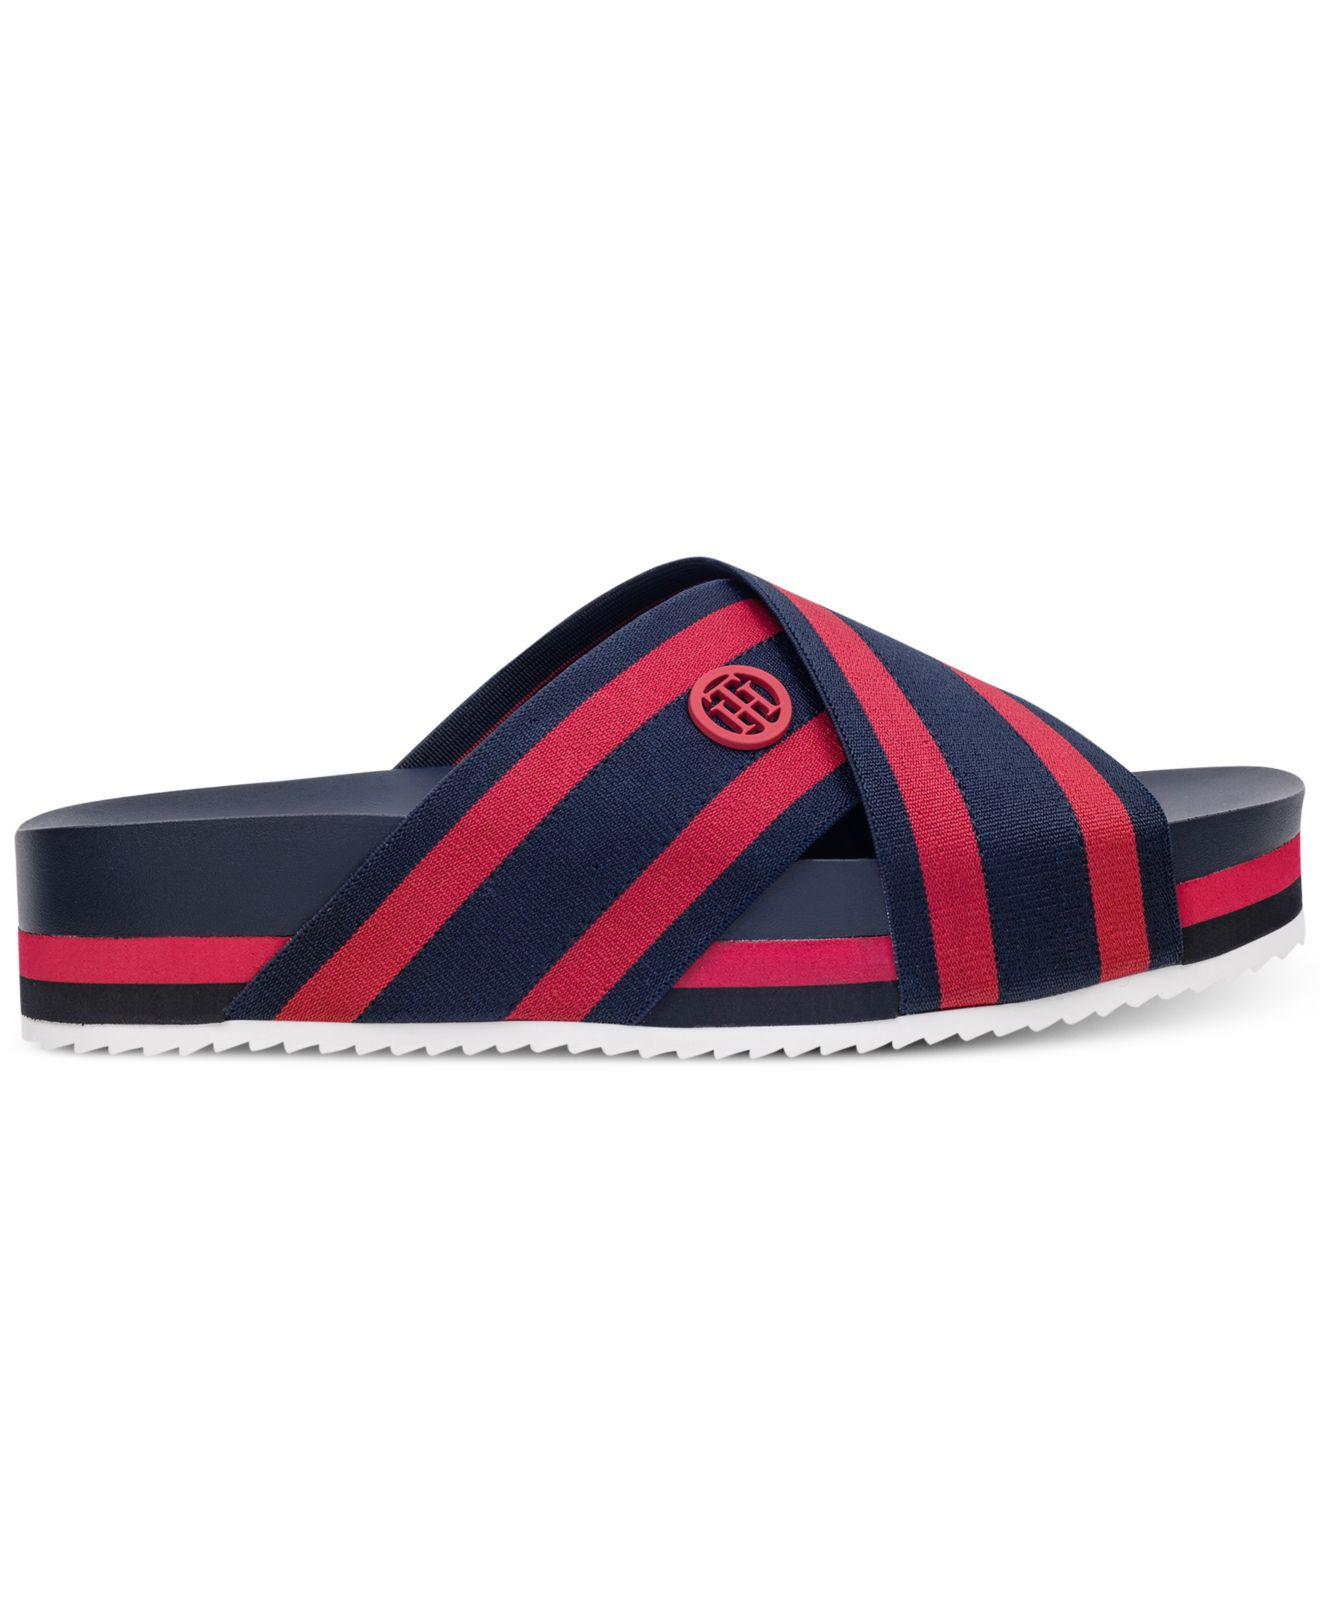 c86e9ec8fd5aa Lyst - Tommy Hilfiger Blysse Flatform Sandals in Blue